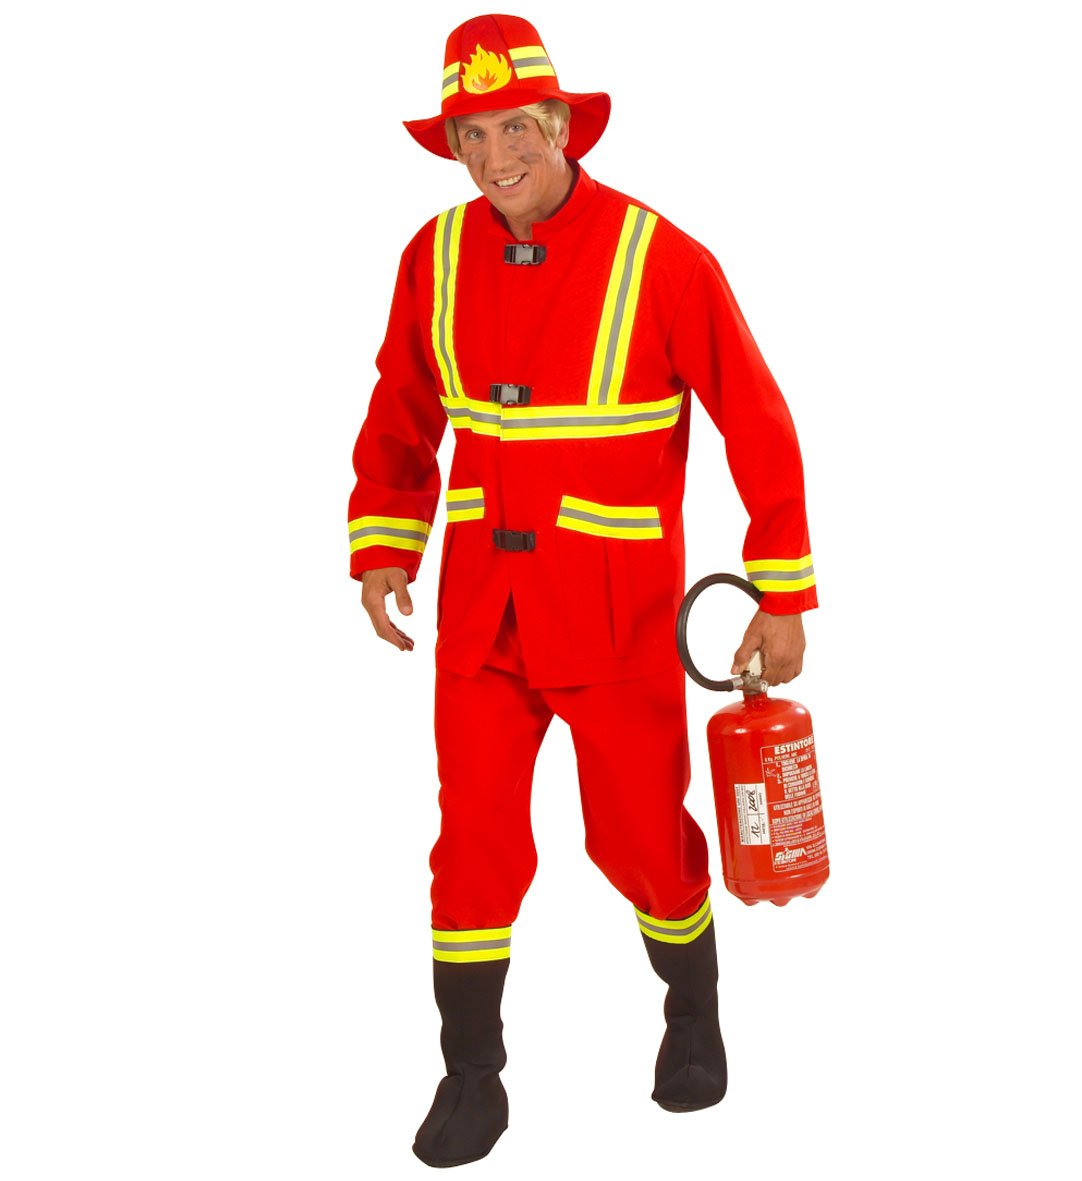 Kostüm Karneval Herren Anzug Feuerwehrmann  22830, mehrfarbig L